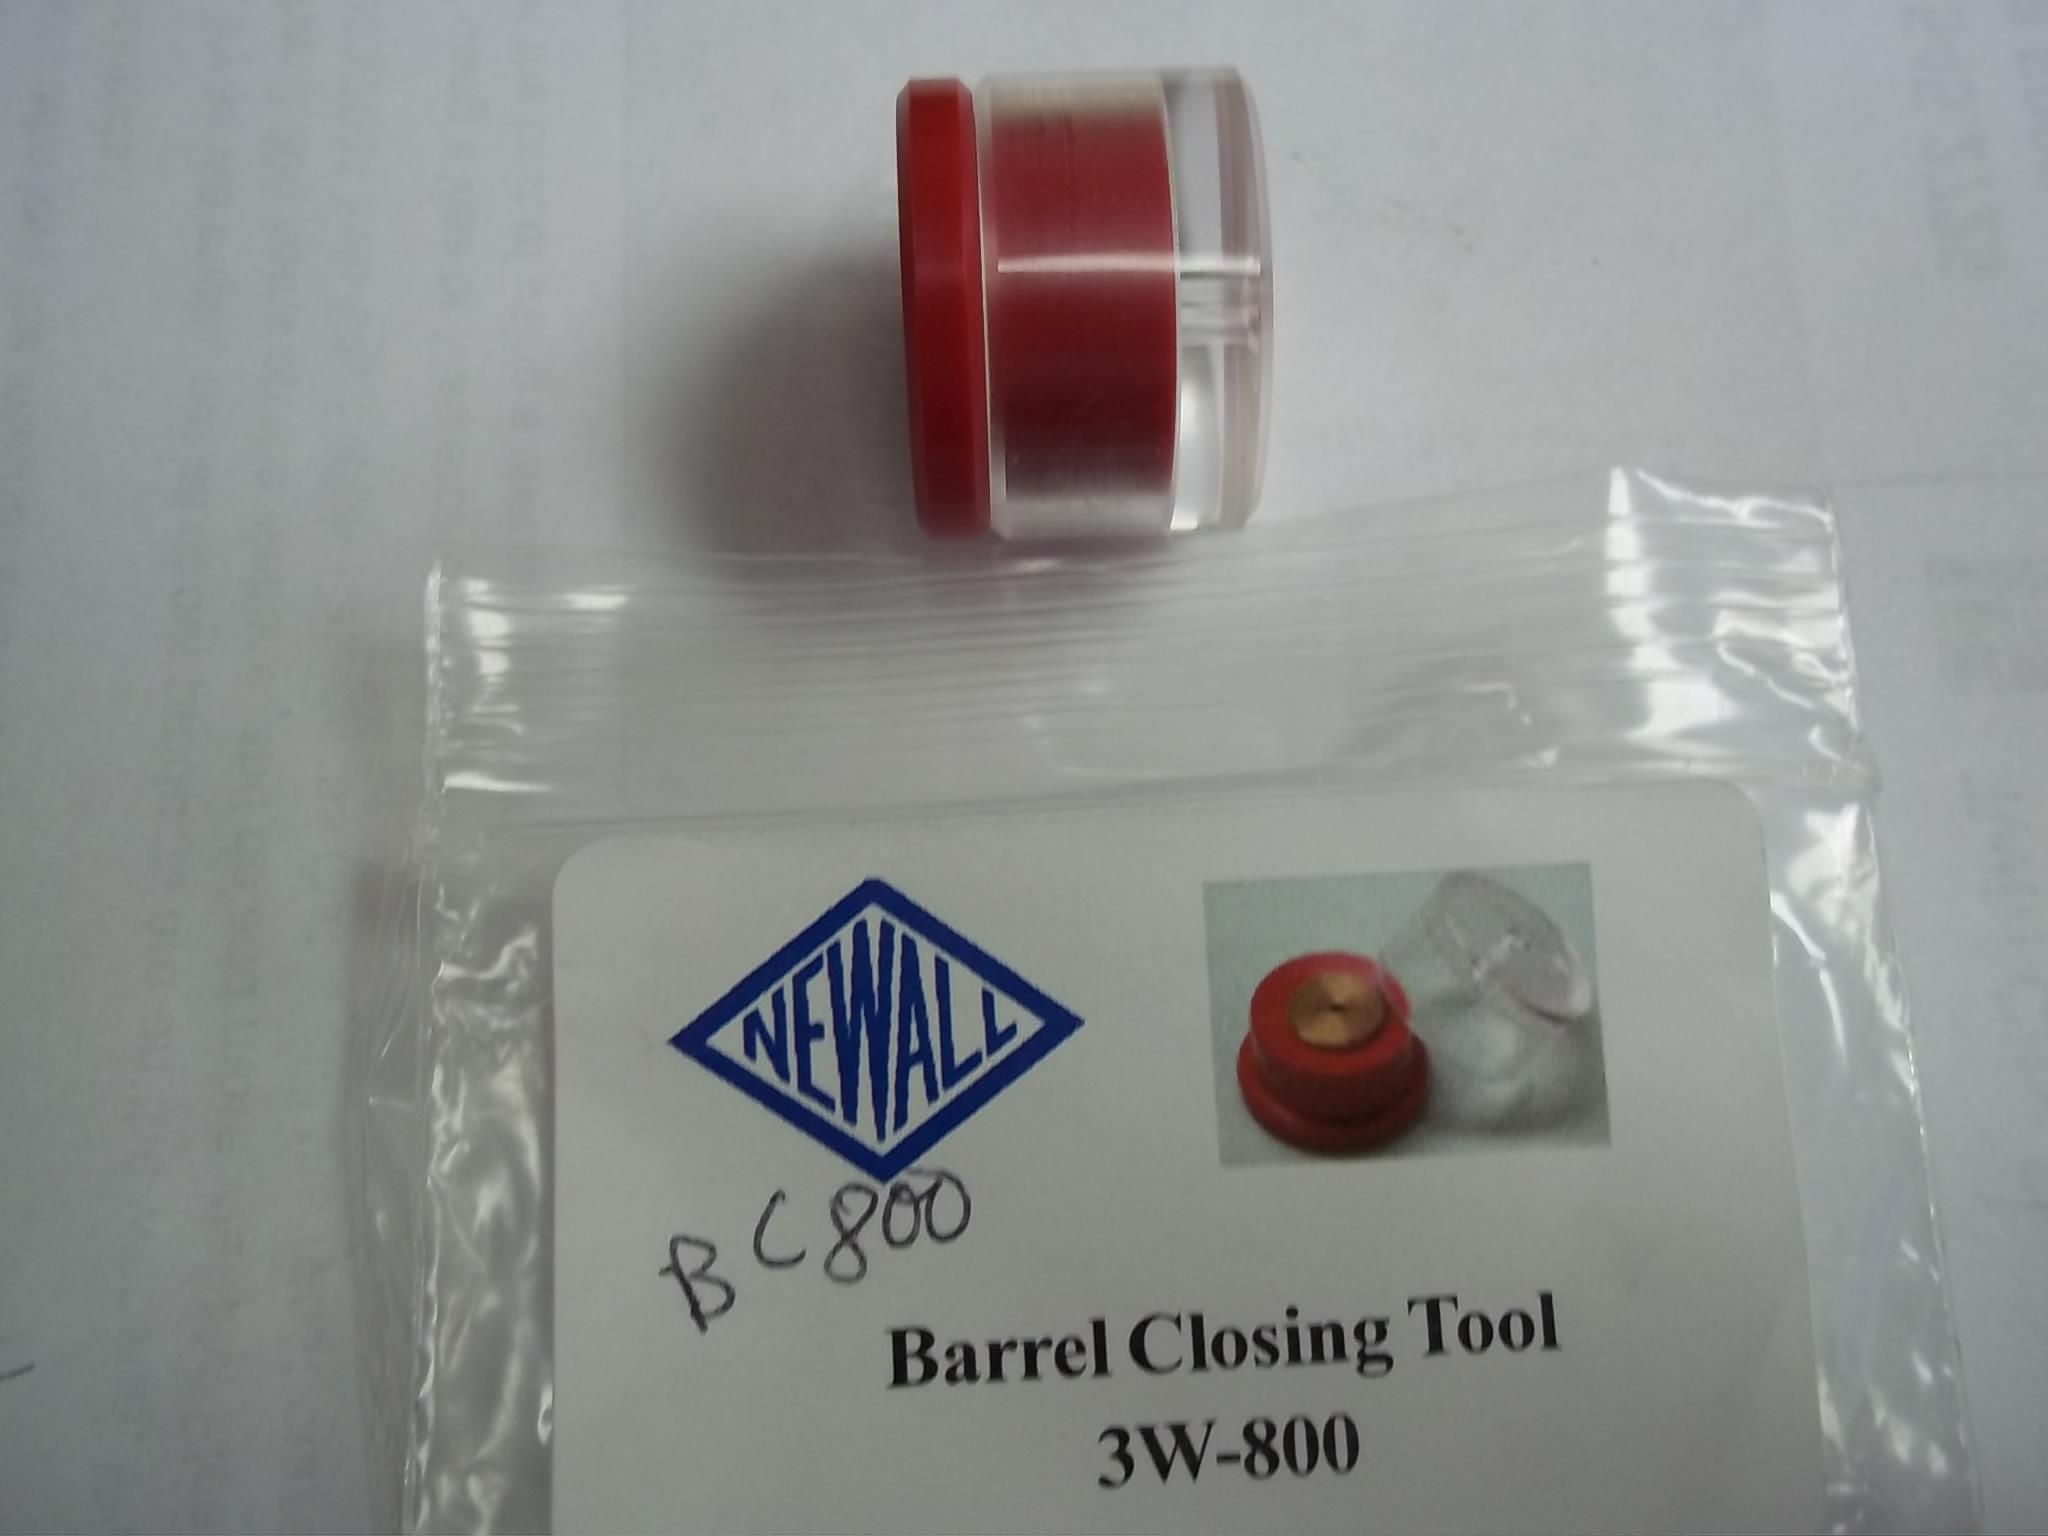 BC800 Barrel Closing Tool- Newall # 3W-800